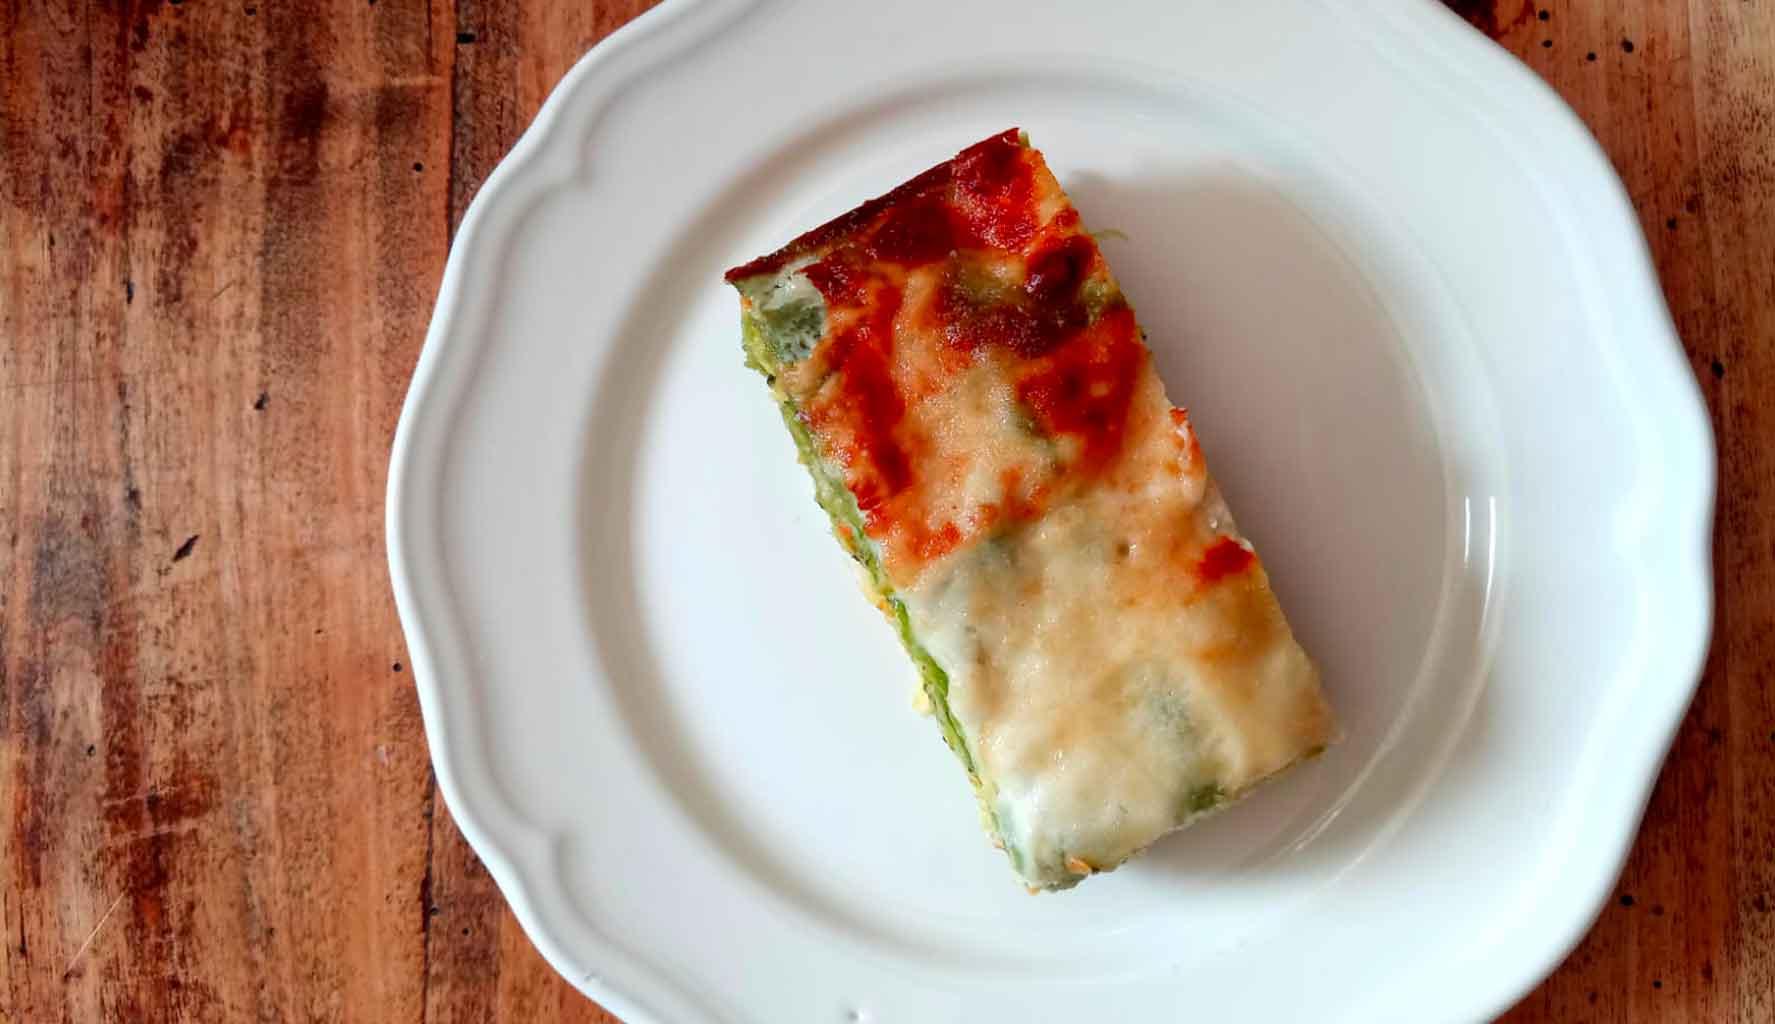 Ricetta Lasagne Kenwood.Ricetta Lasagne Vegetariane Al Pesto Ricette Kenwood Club